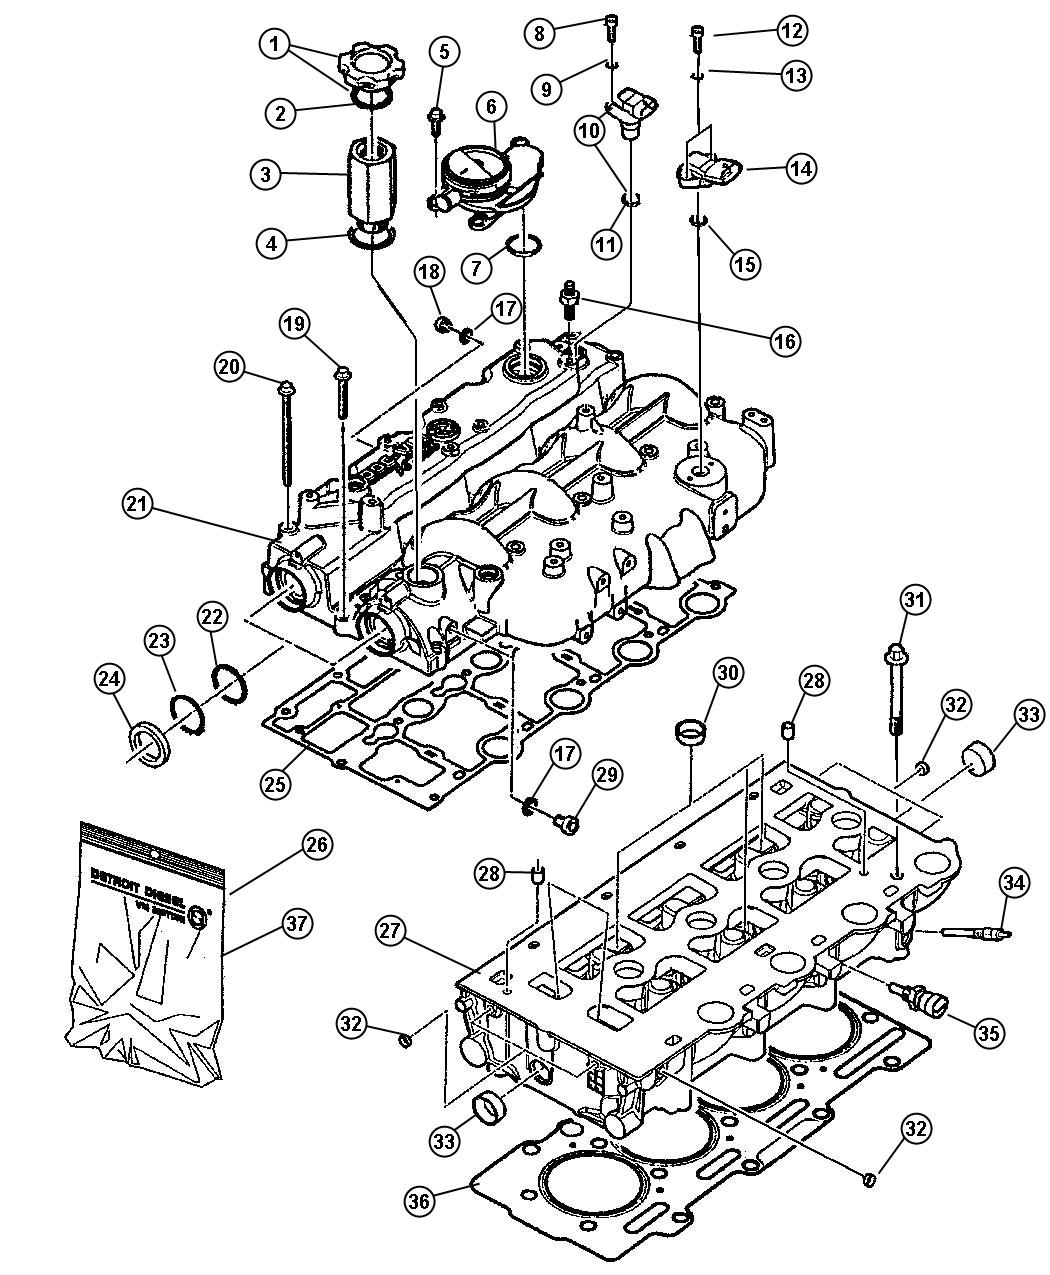 jeep wrangler head kit